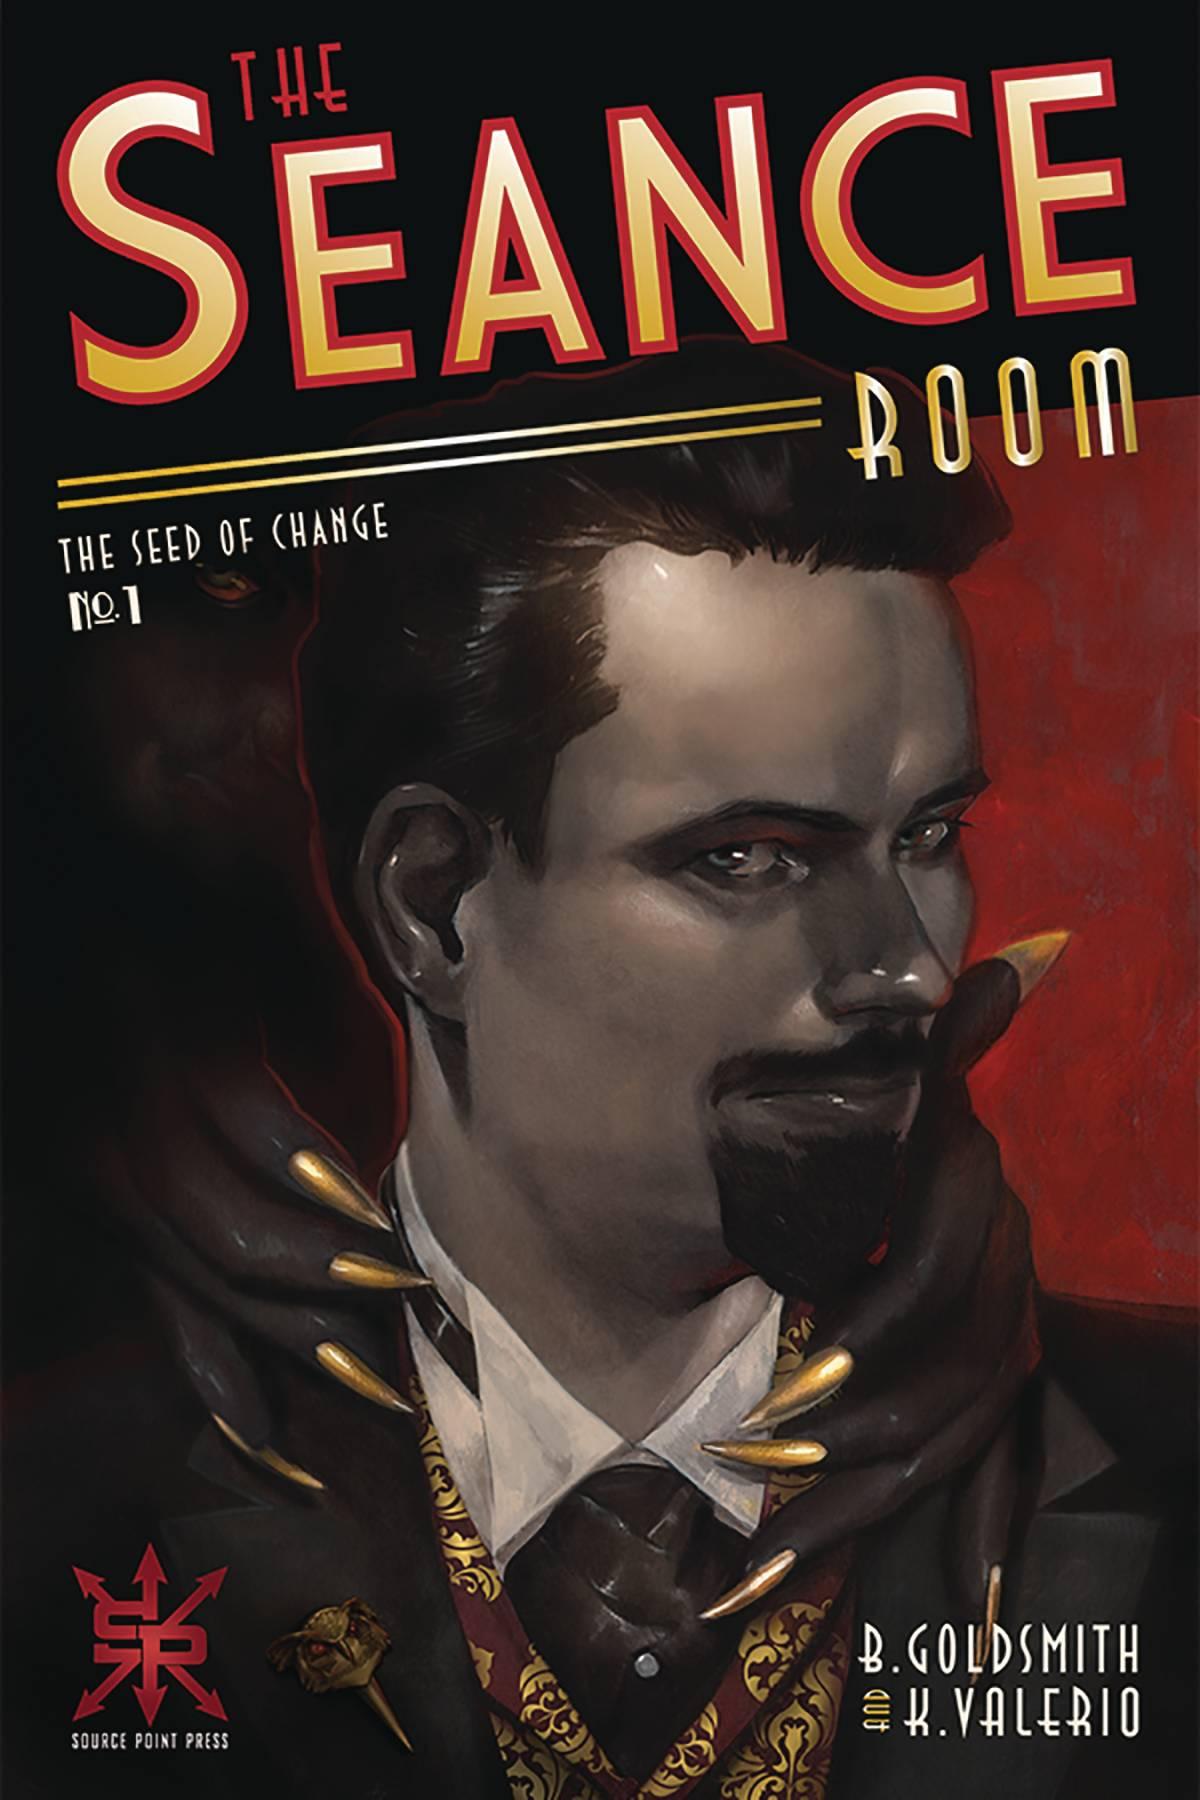 The Seance Room #1 (2020)